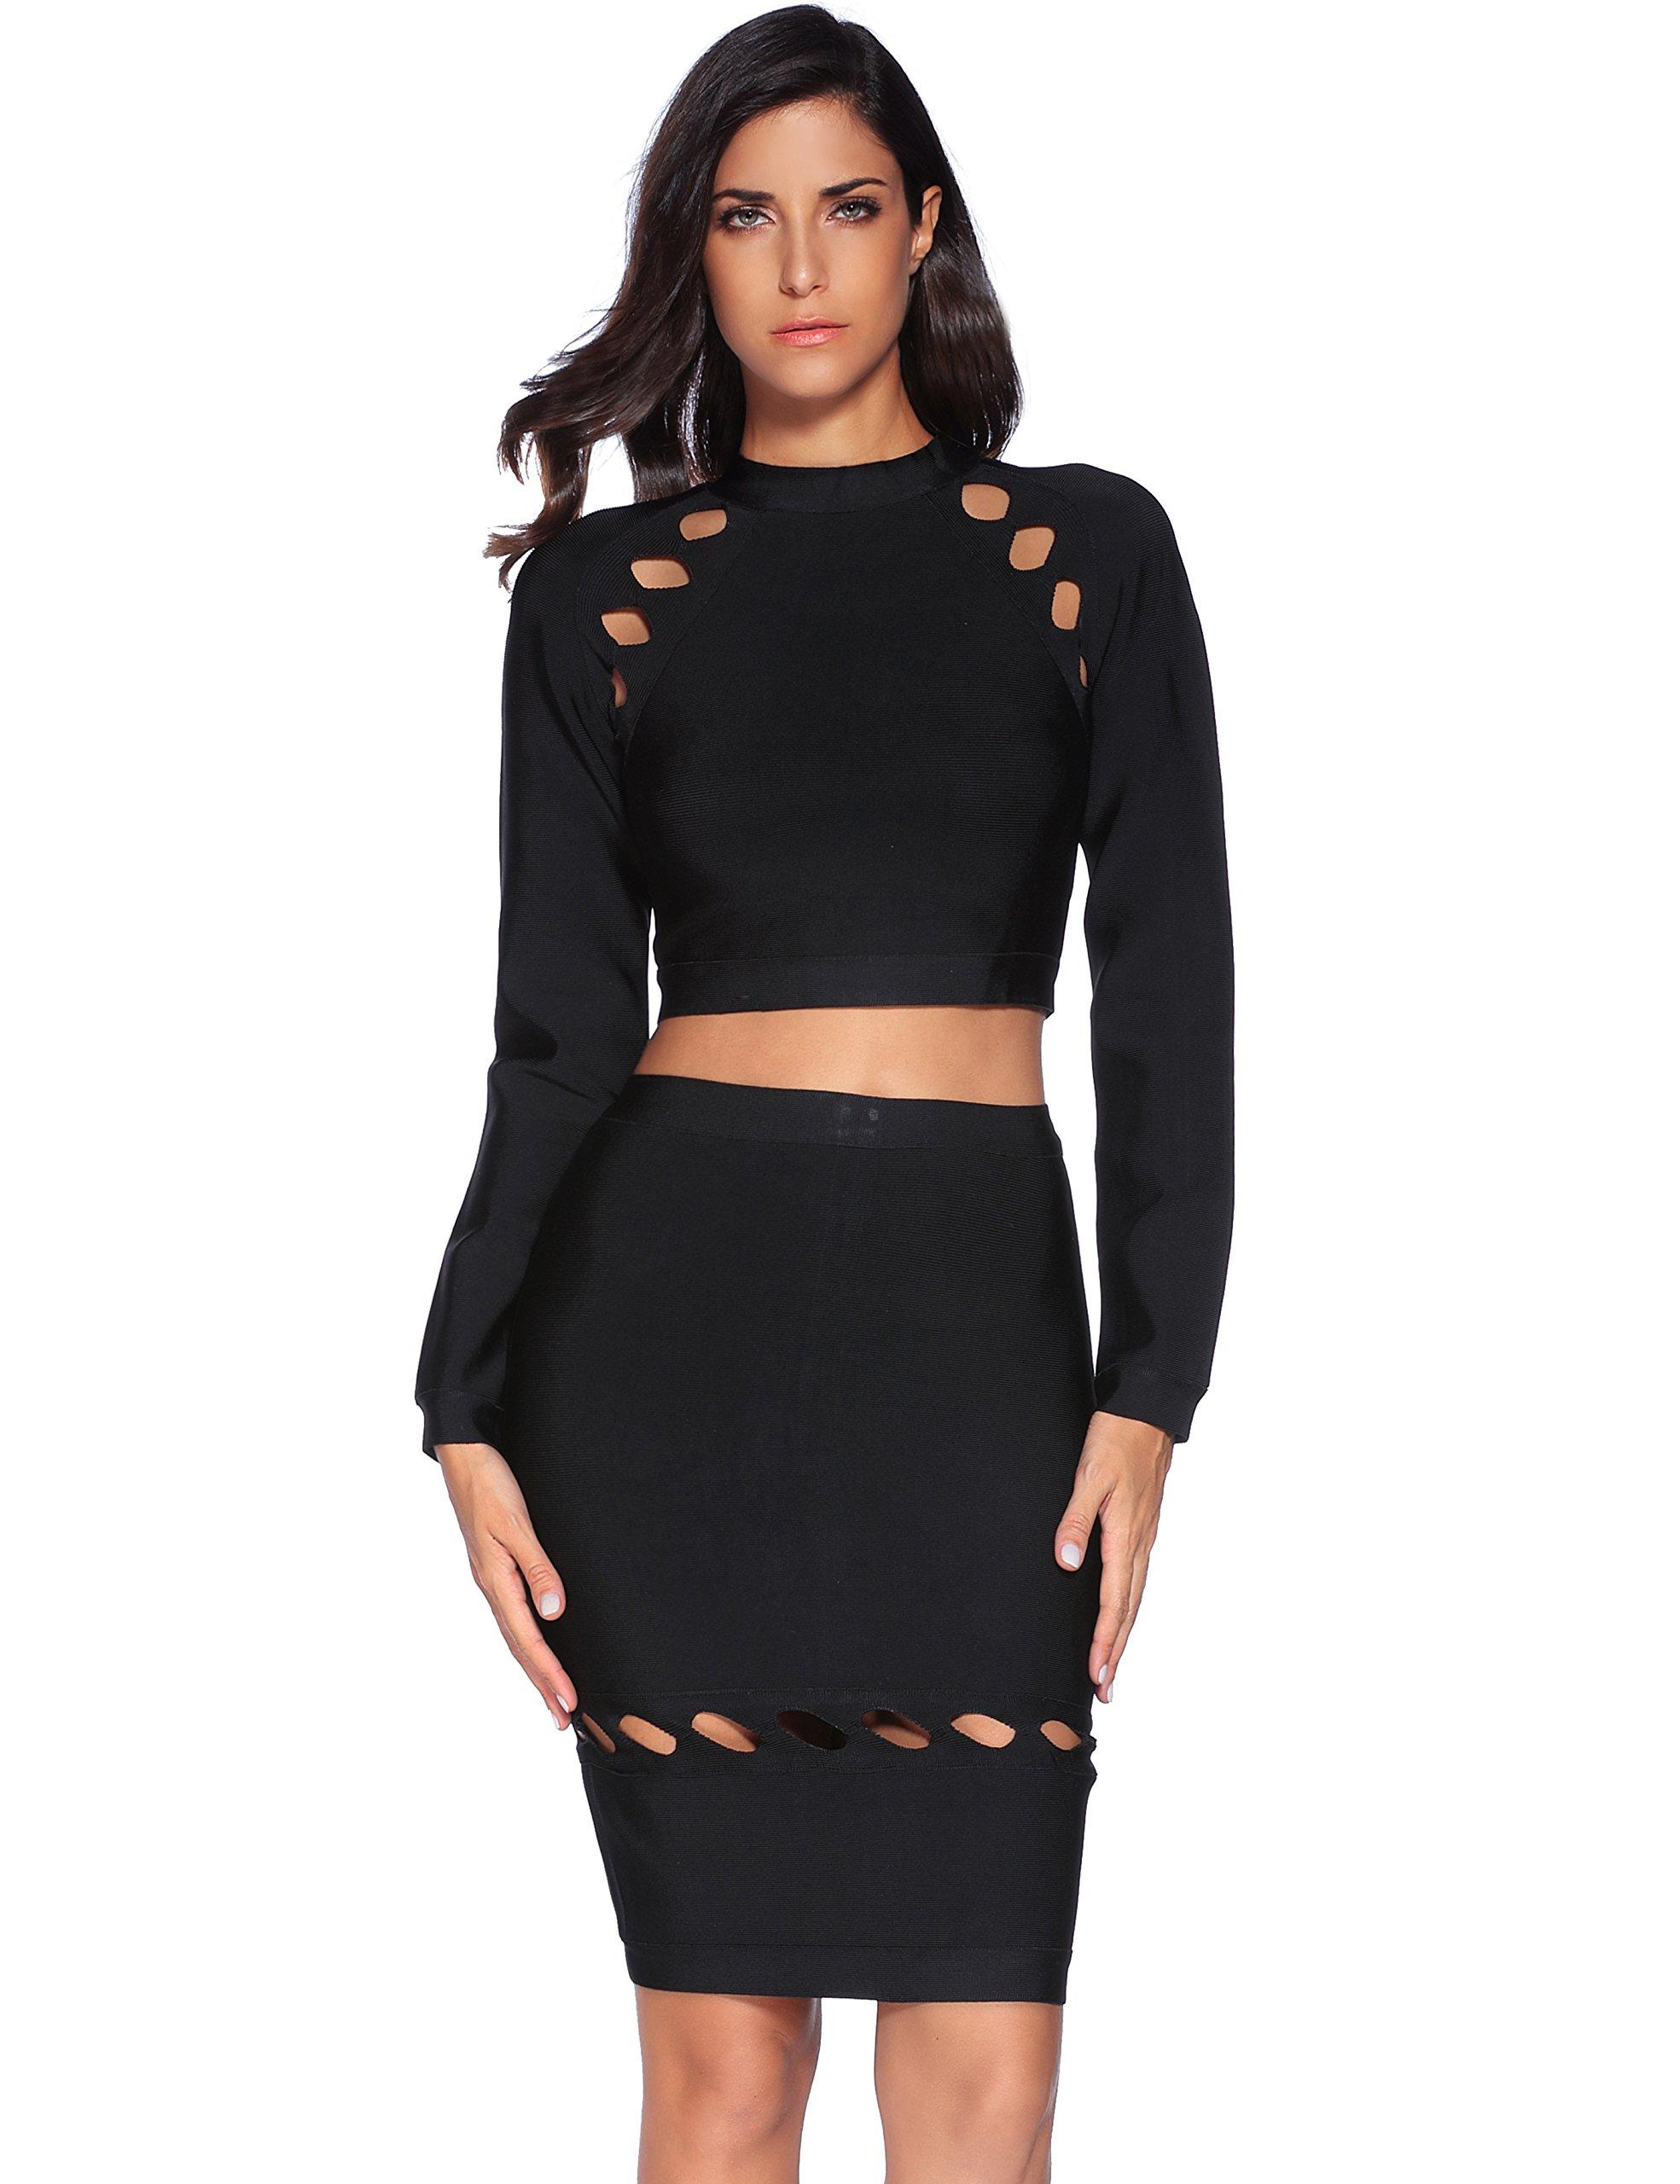 Meilun Women's Rayon 2 Pcs Long Sleeve Crop Top Split Skirt Set Bodycon Bandage Party Dress Large Black